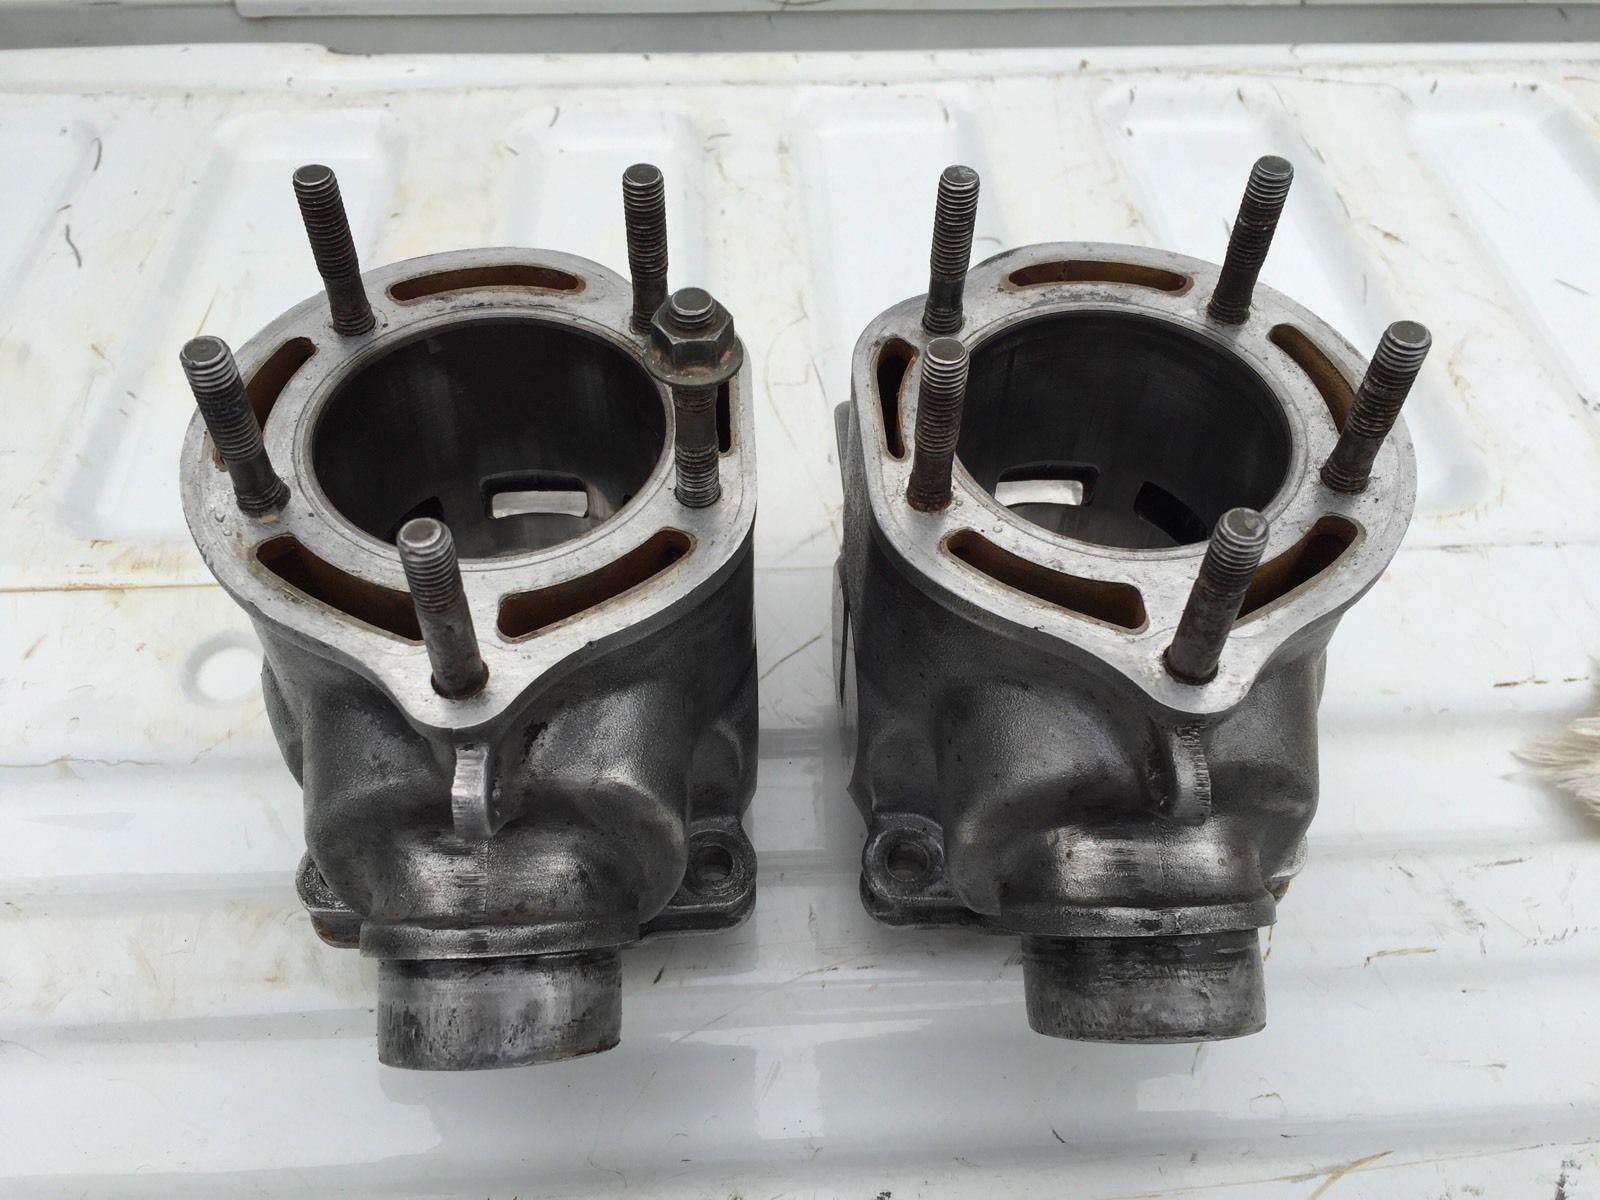 medium resolution of banshee ported 66mm stock cylinders with pistons with pistons cylinders stock ported banshee